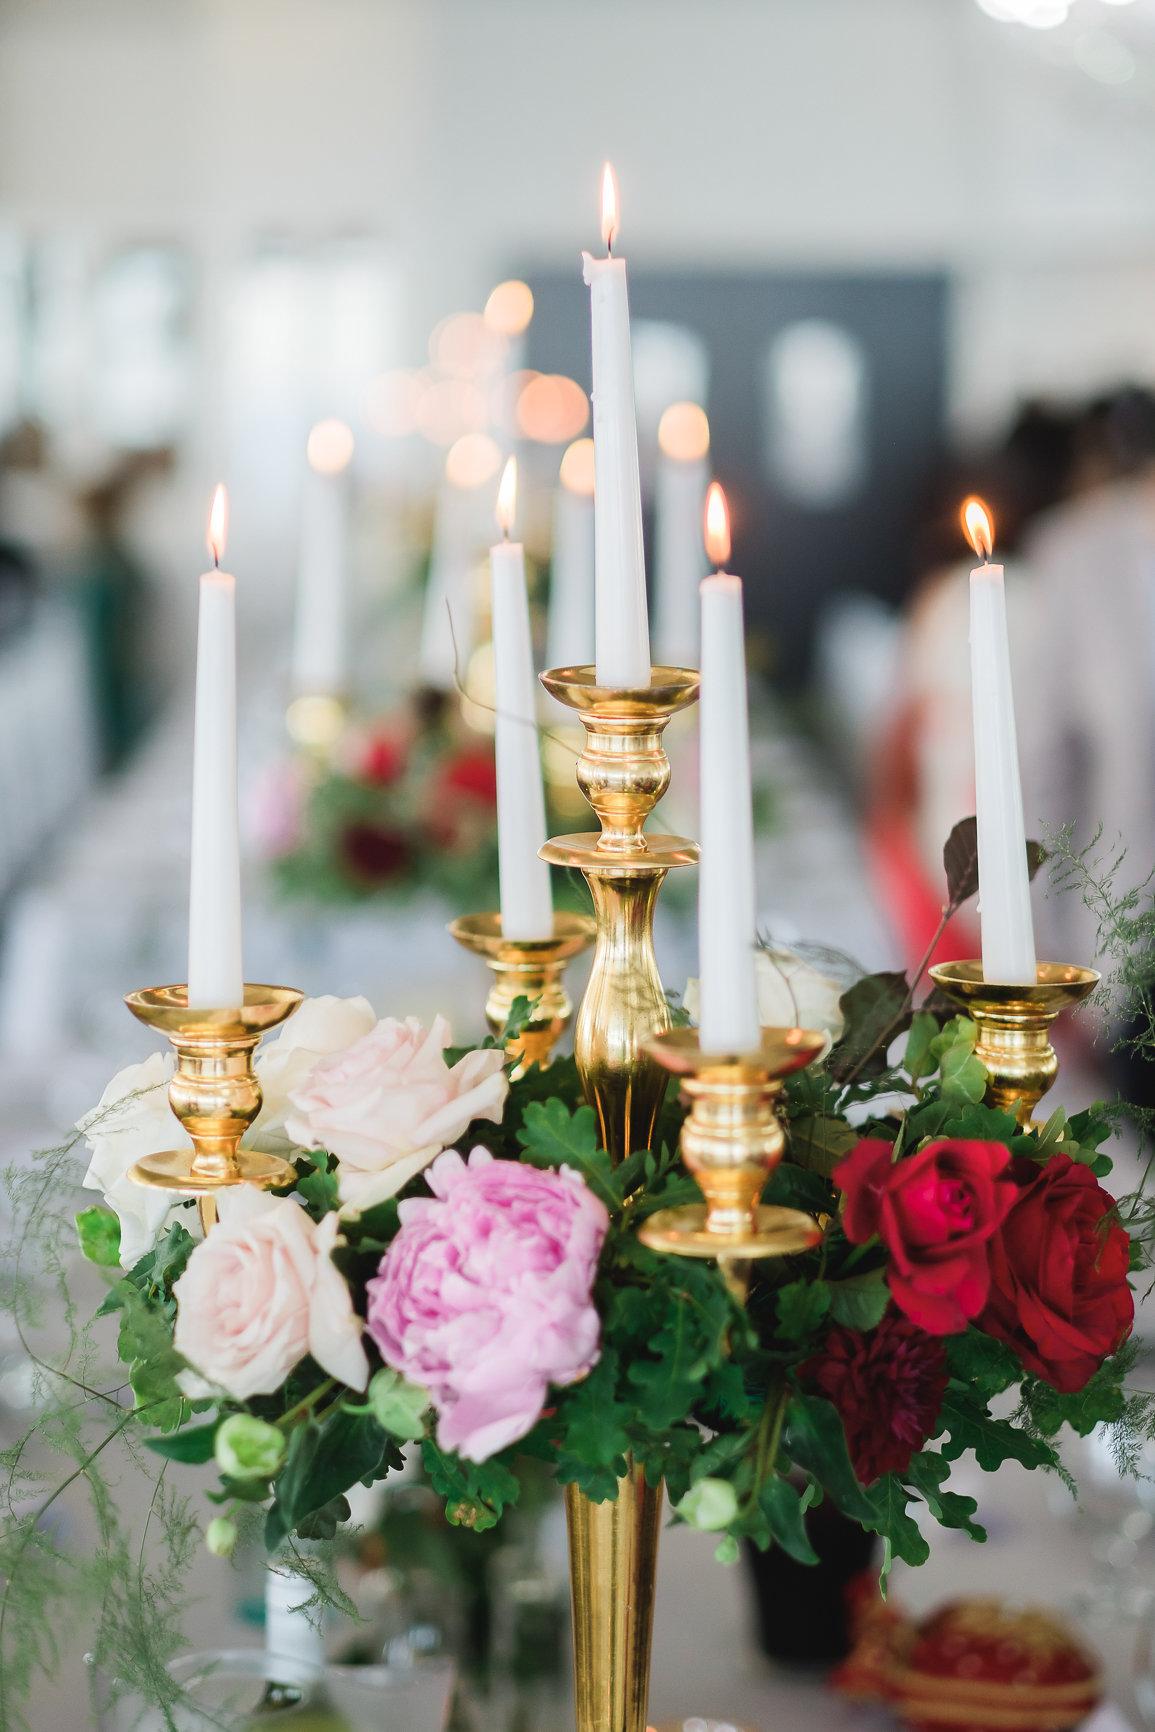 Wedding Decorations and Wedding Flowers at Panorama House Wedding